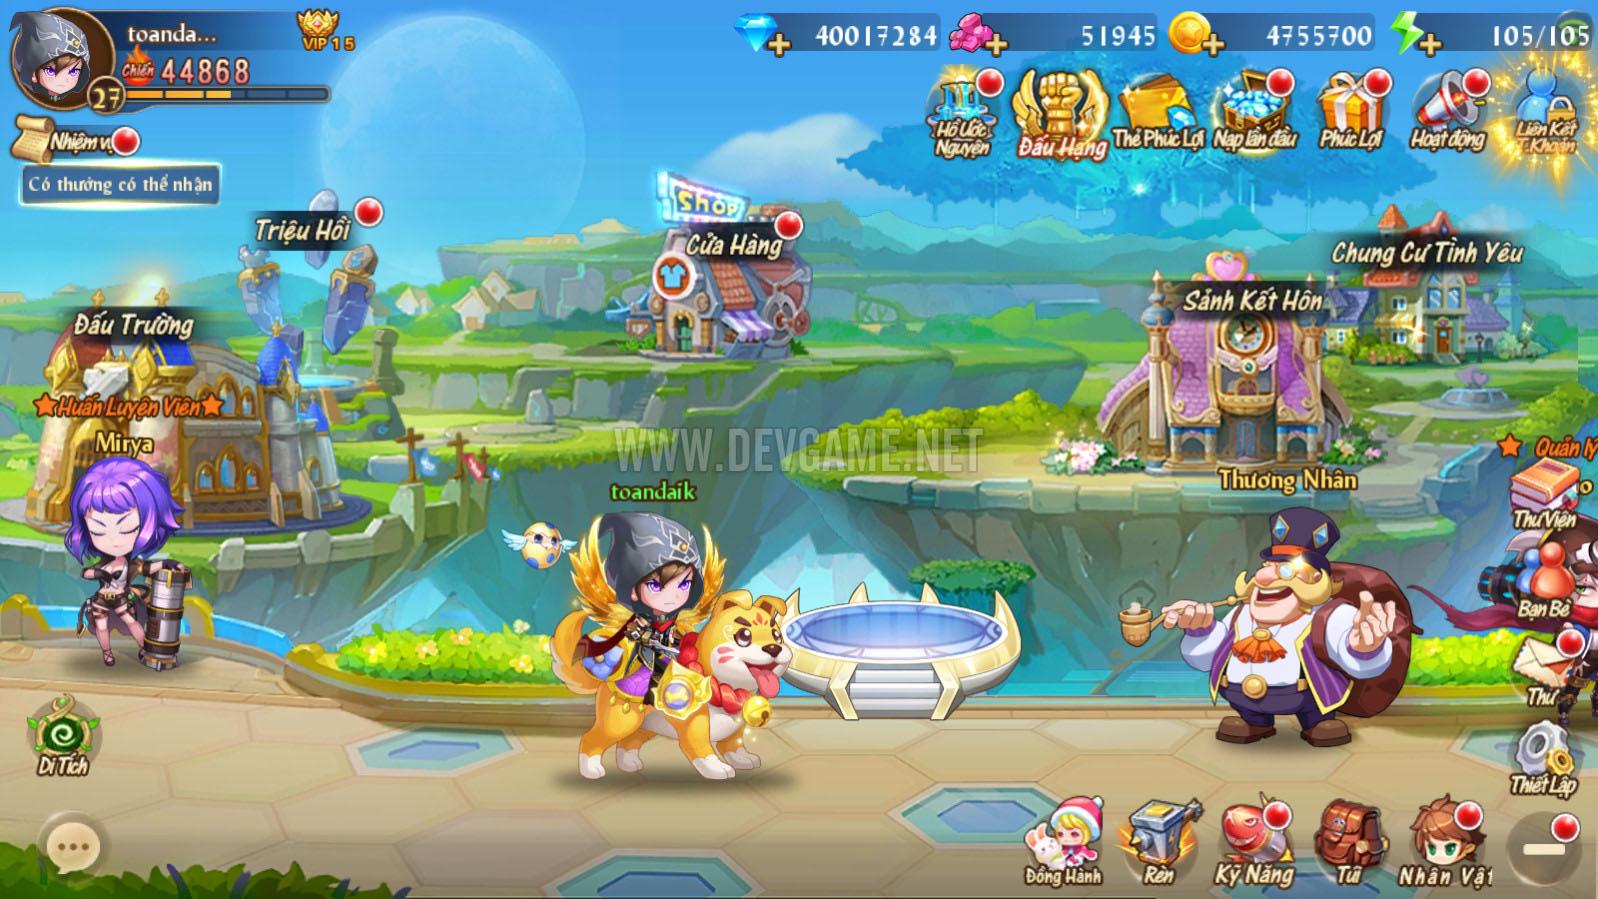 Server Mobile Game GunPow Mobi | DevGame.Net - Cung cấp và cài đặt game  server, Server Client Game, Server Webgame, Server Mobile Game, Kiếm Thế  Offline - Kiếm Thế Private | Download